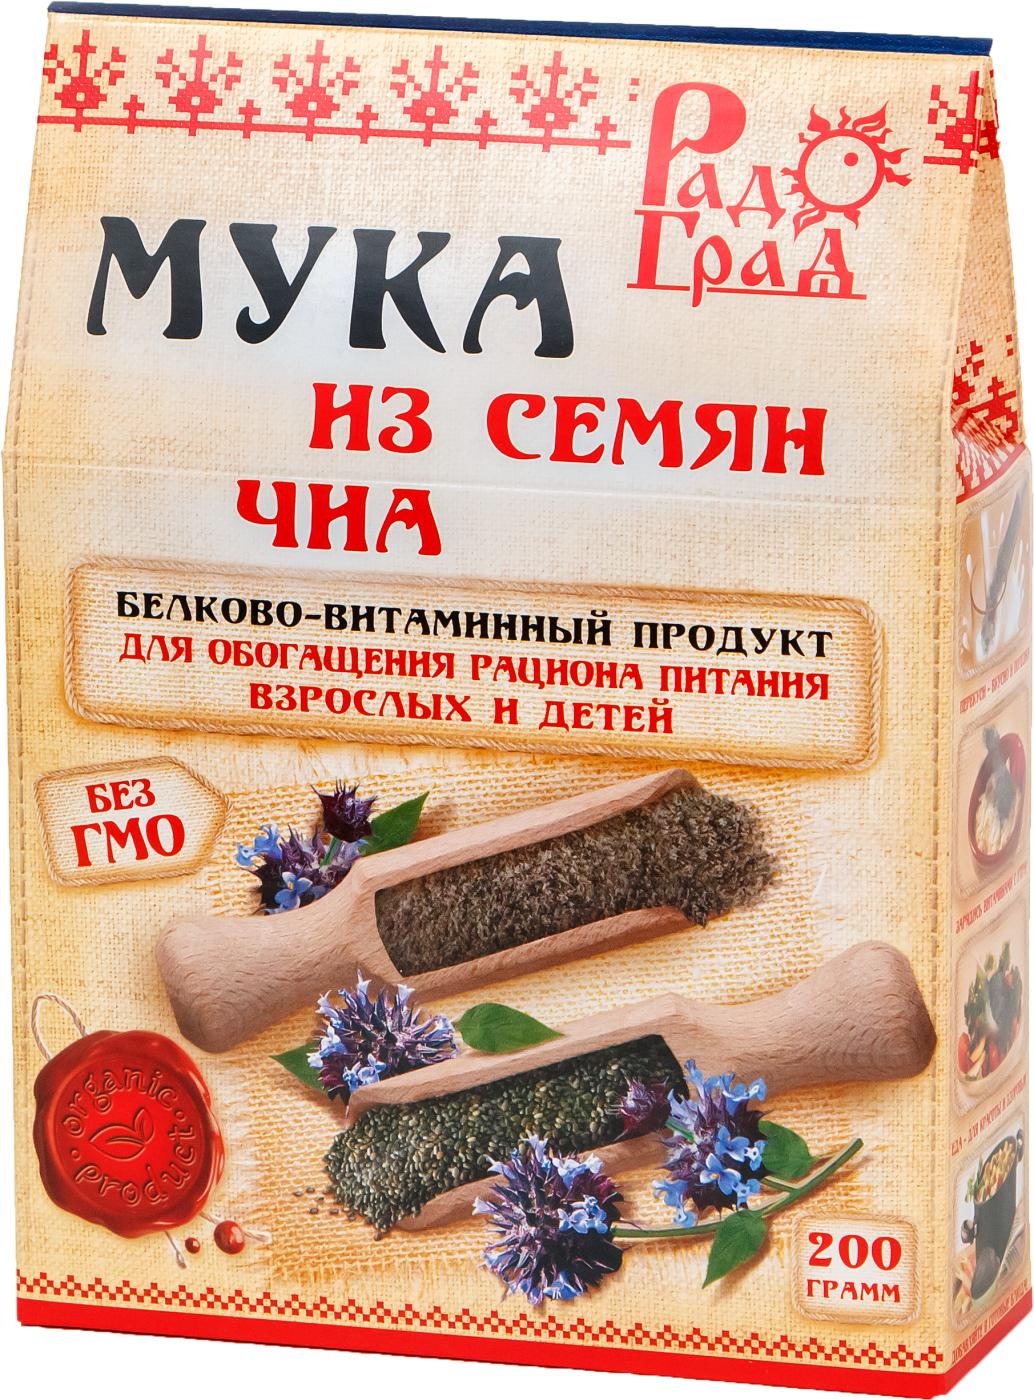 Мука из семян чиа, Радоград, 200г.